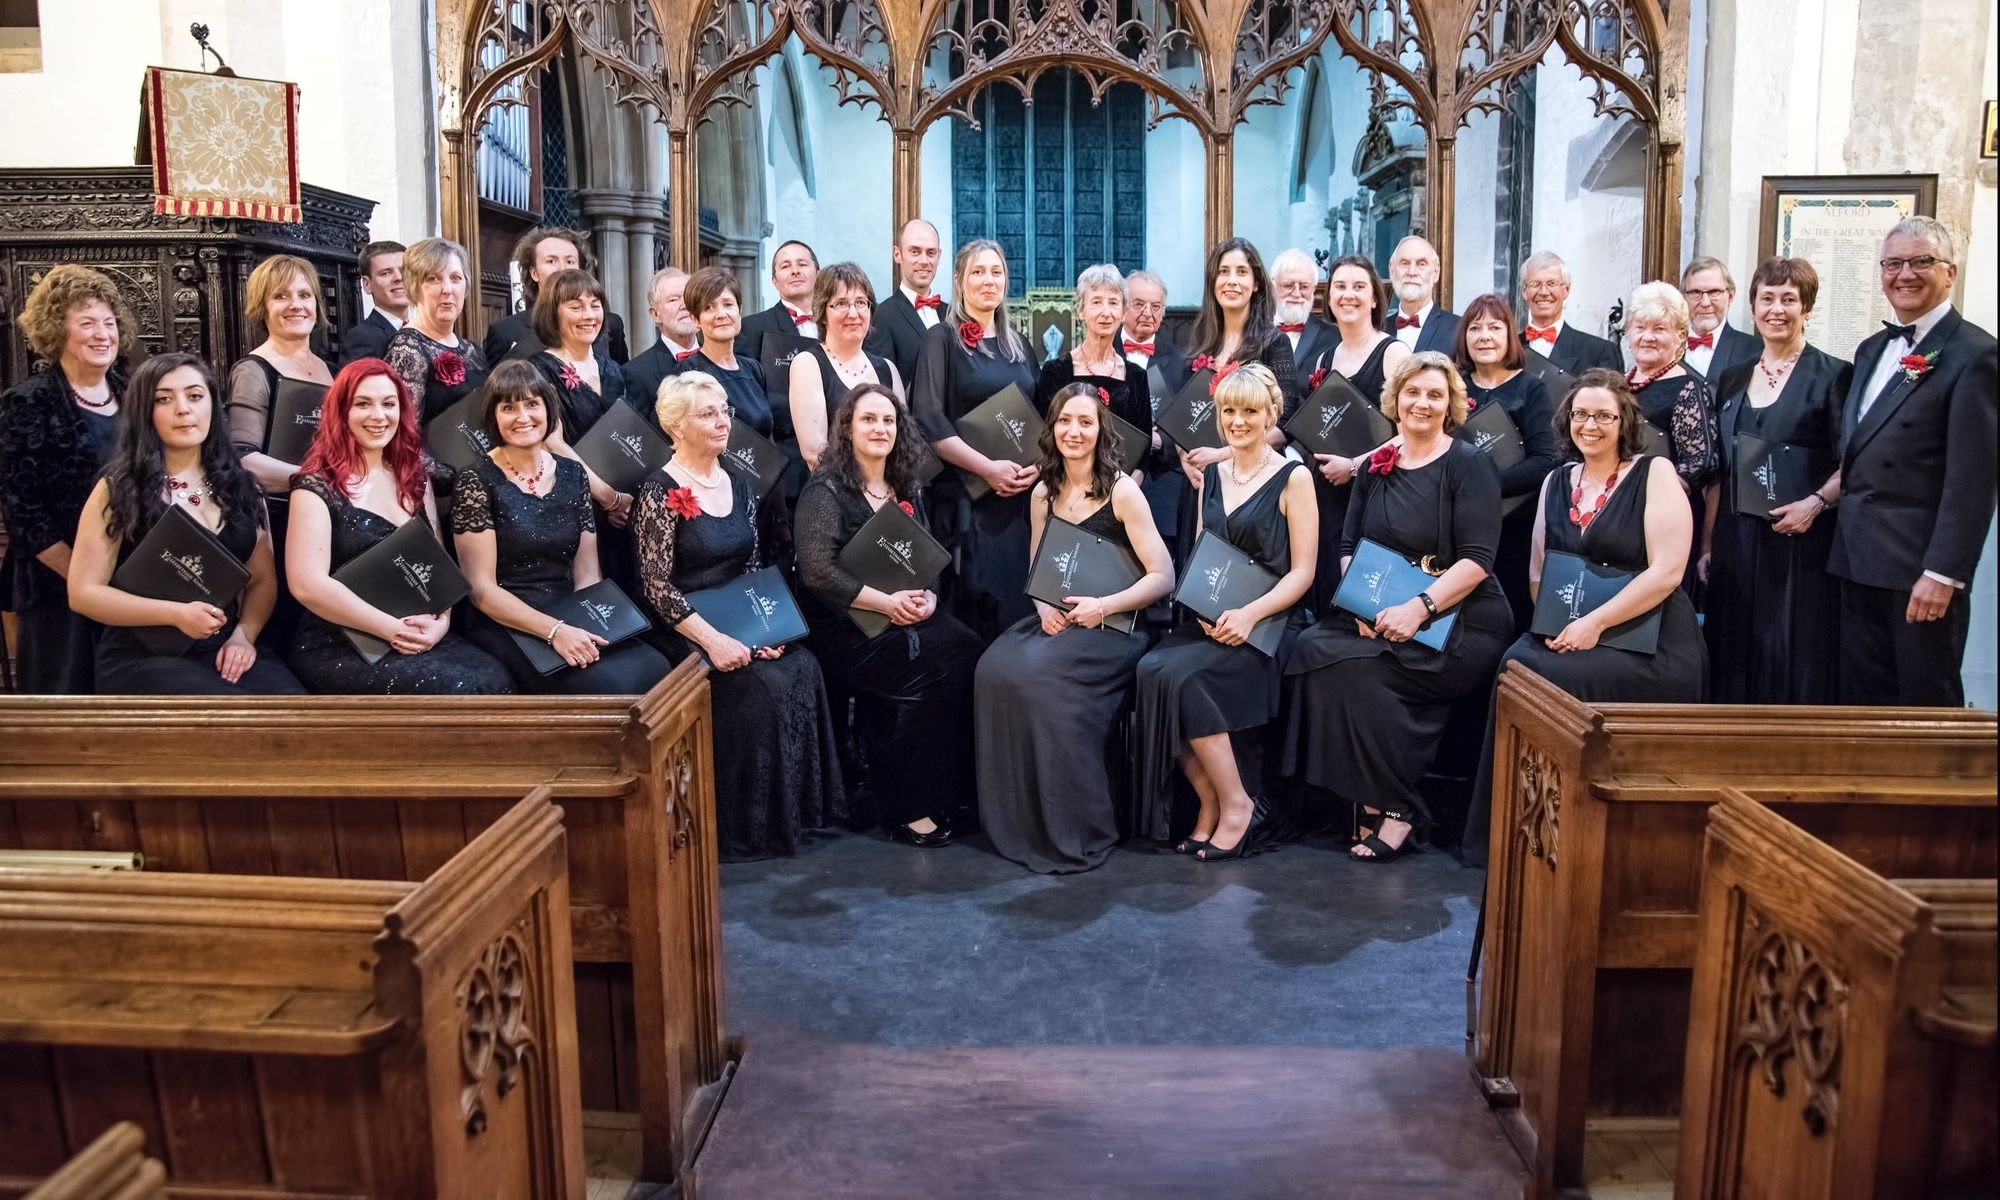 The Elizabethan Singers, Alford